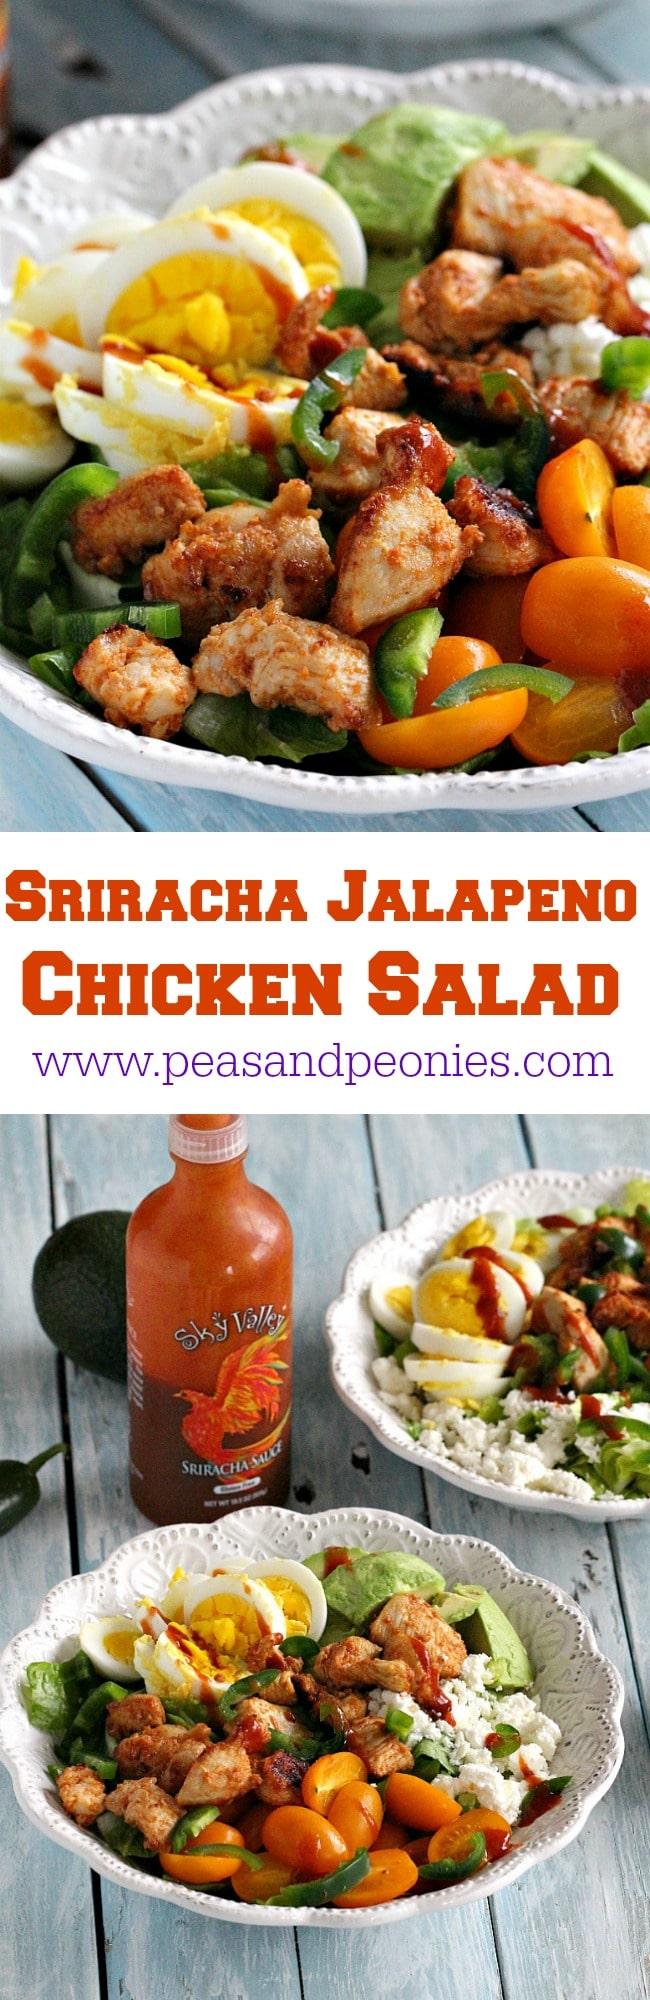 sriracha chicken salad PIN